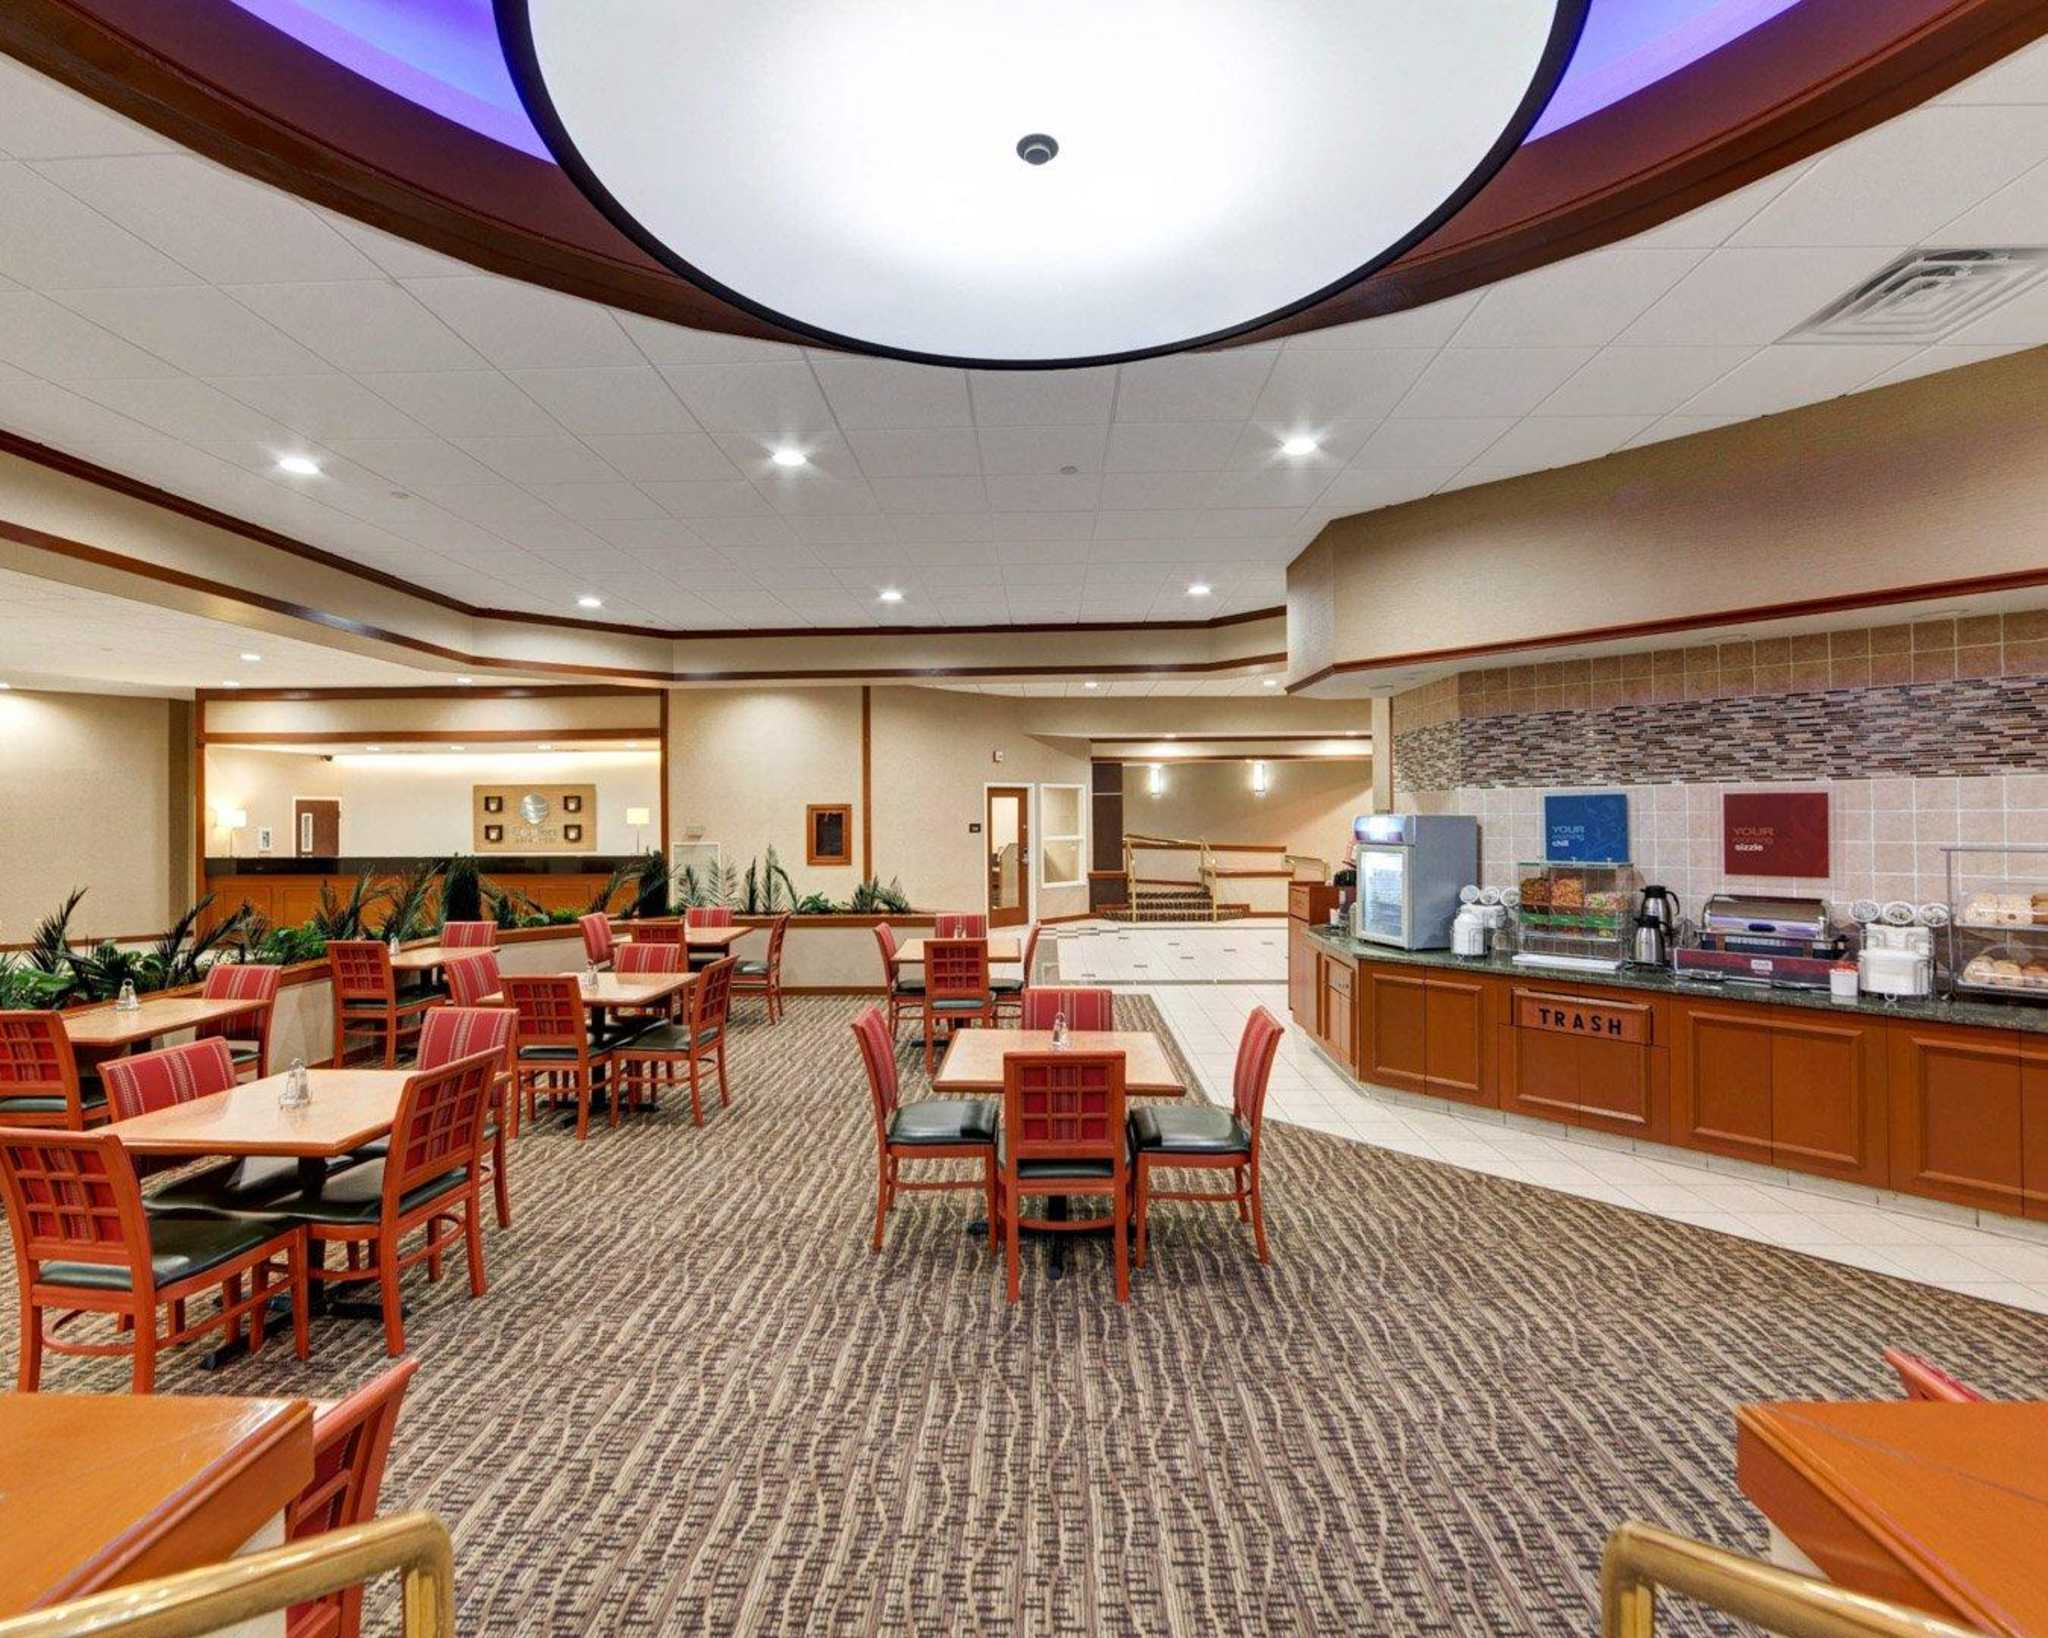 Comfort Inn & Suites Plano East image 34